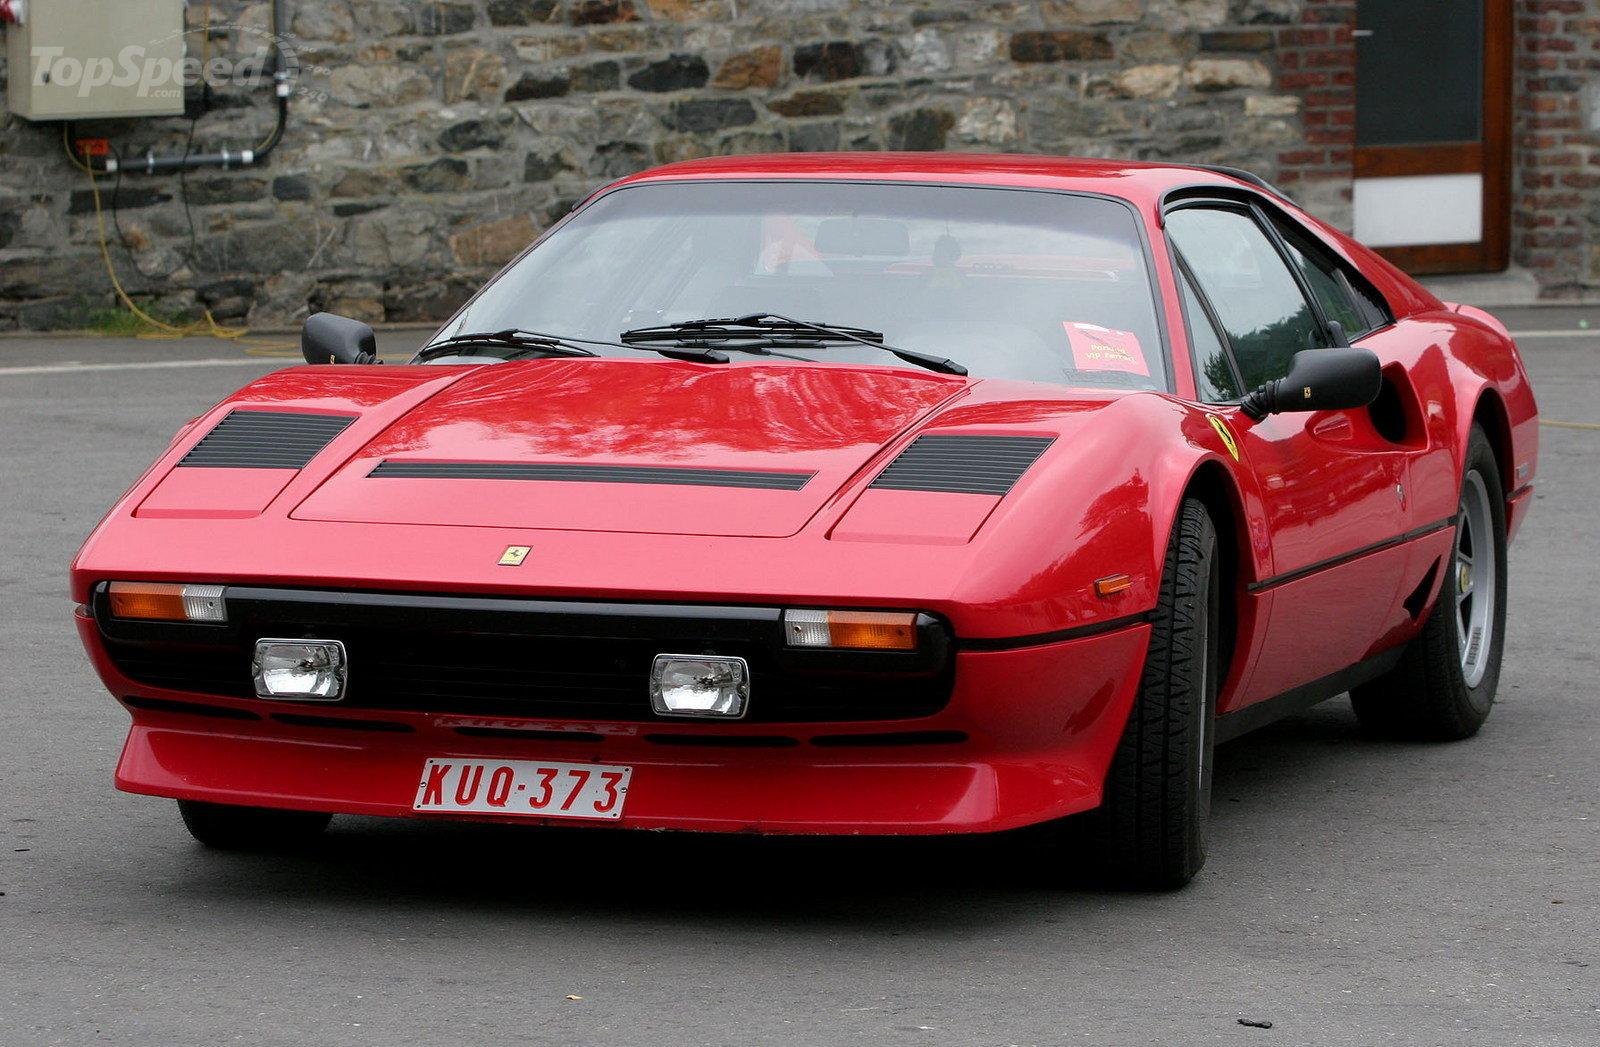 Ferrari Sports Cars Wallpapers Hd Newer Post Older Post Home